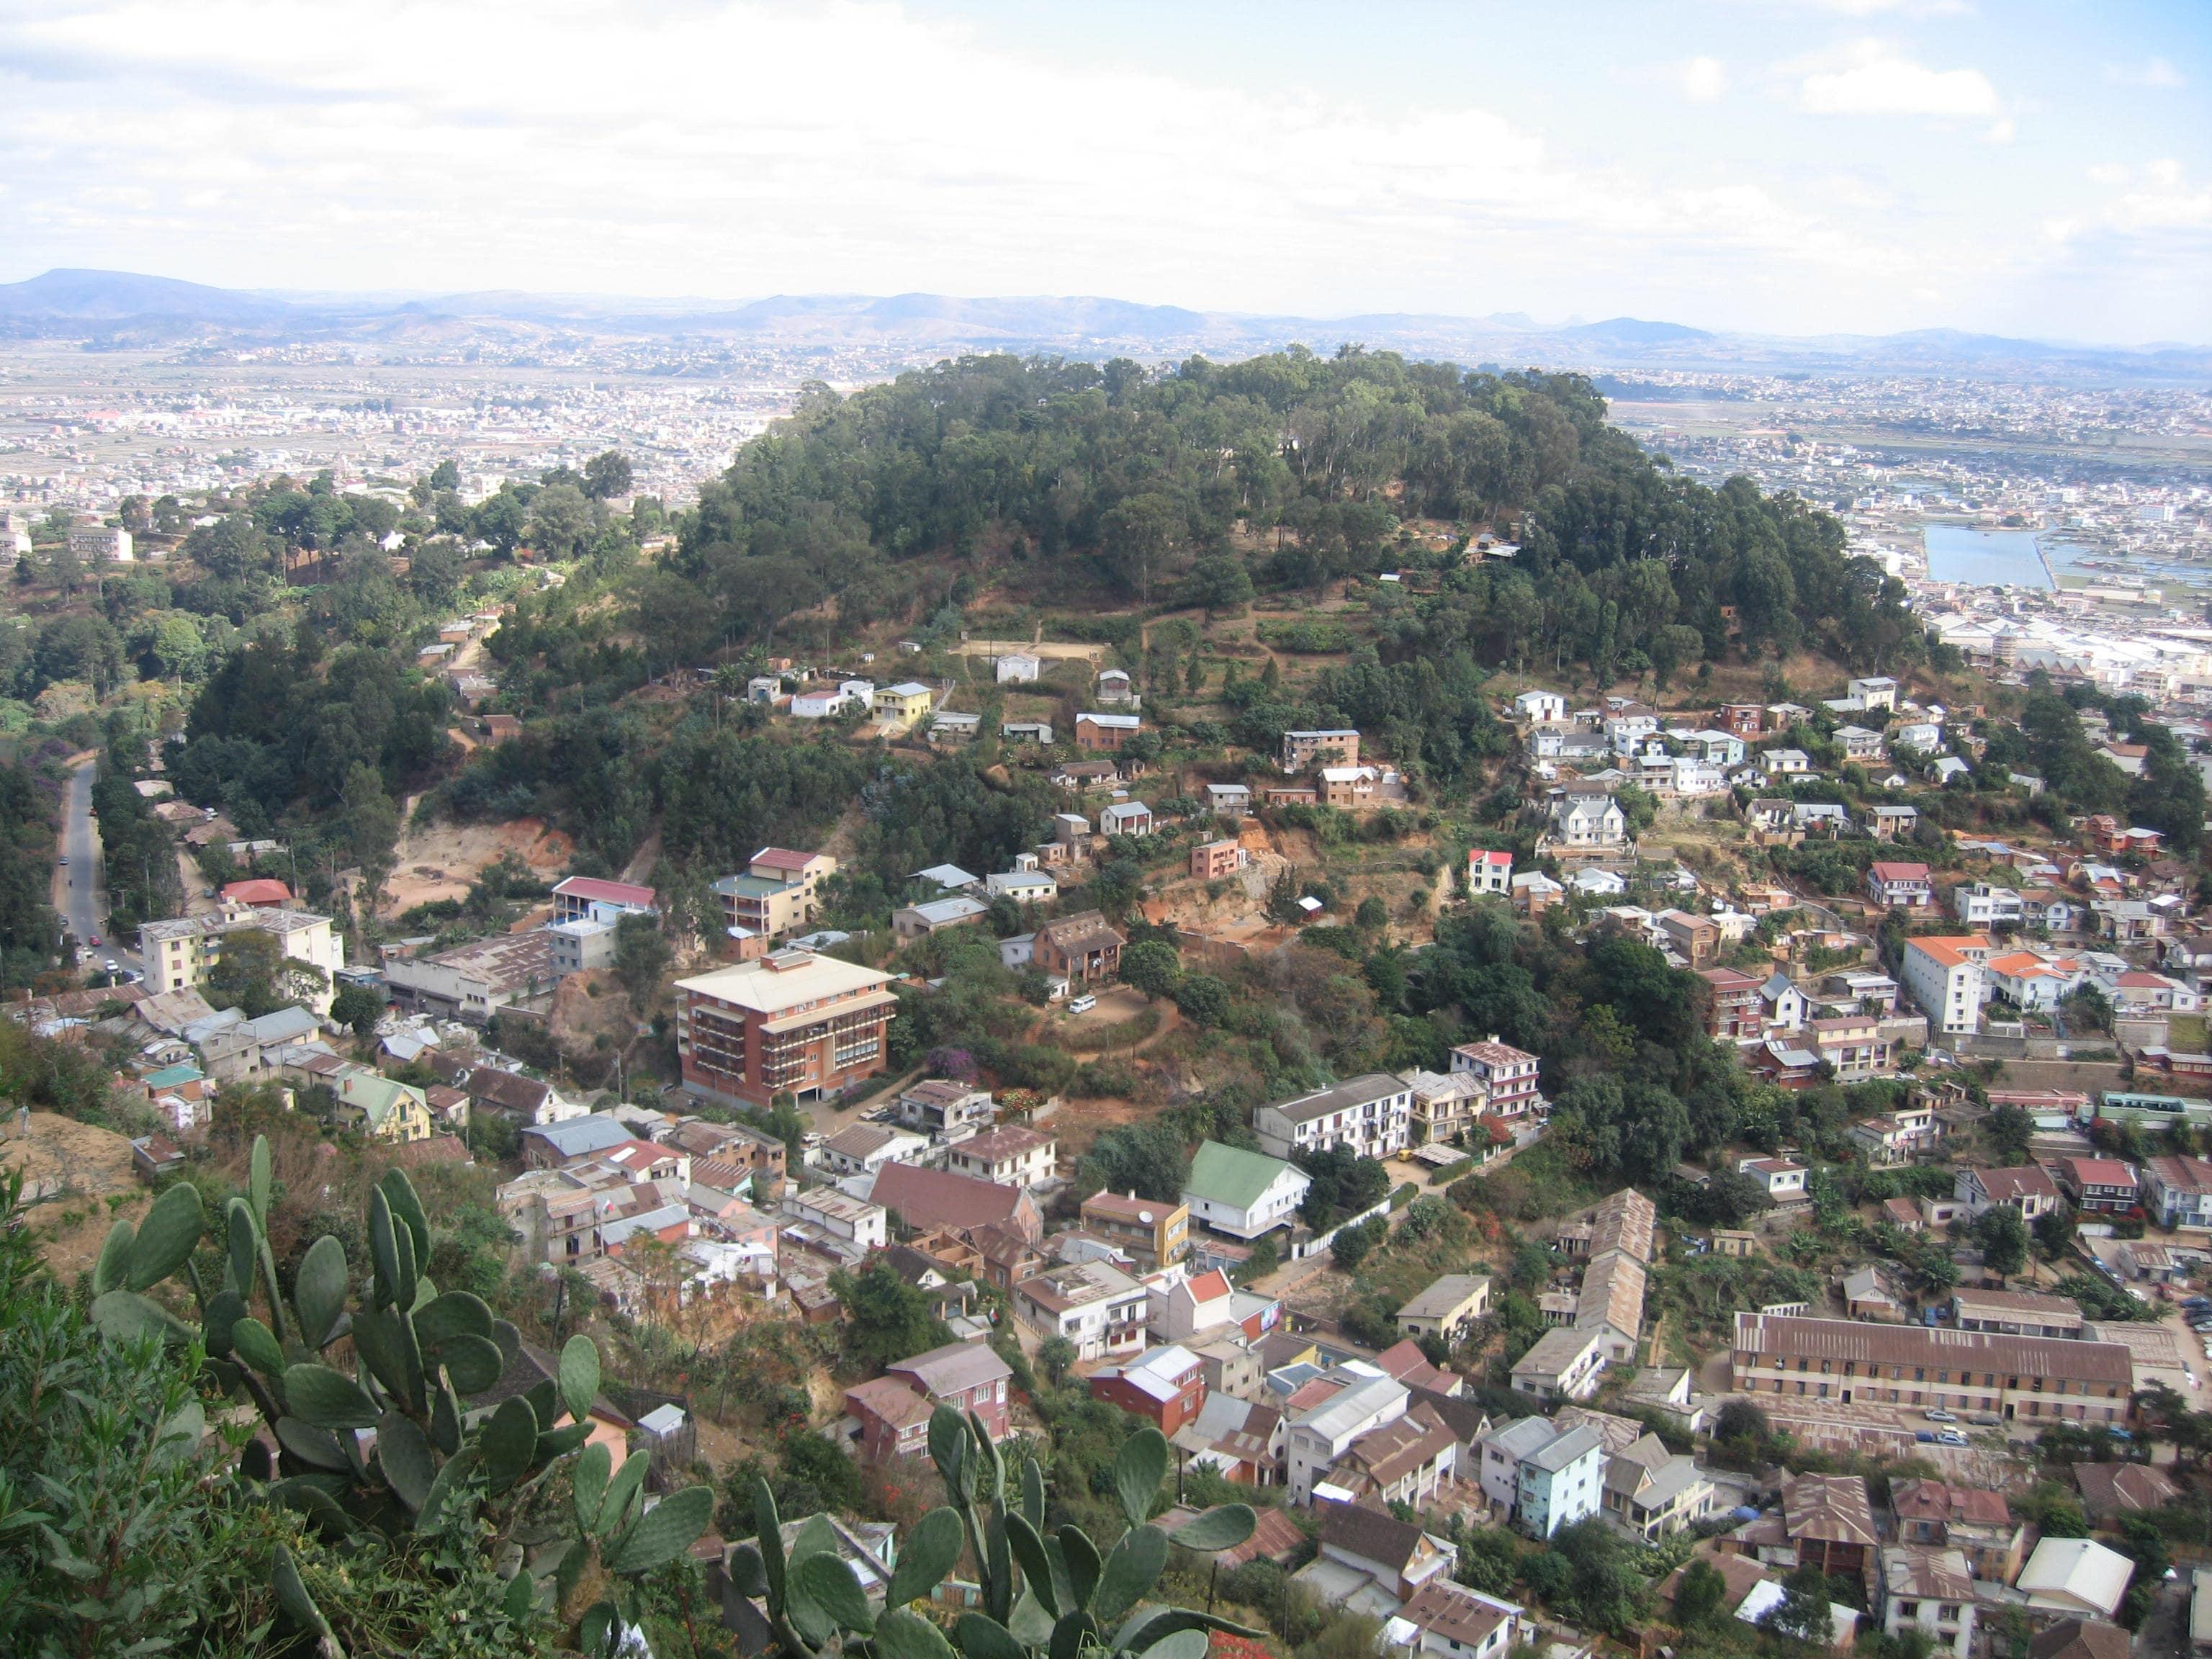 "<span  class=""uc_style_uc_tiles_grid_image_elementor_uc_items_attribute_title"" style=""color:#ffffff;"">Antananarivo, capitale malgache</span>"